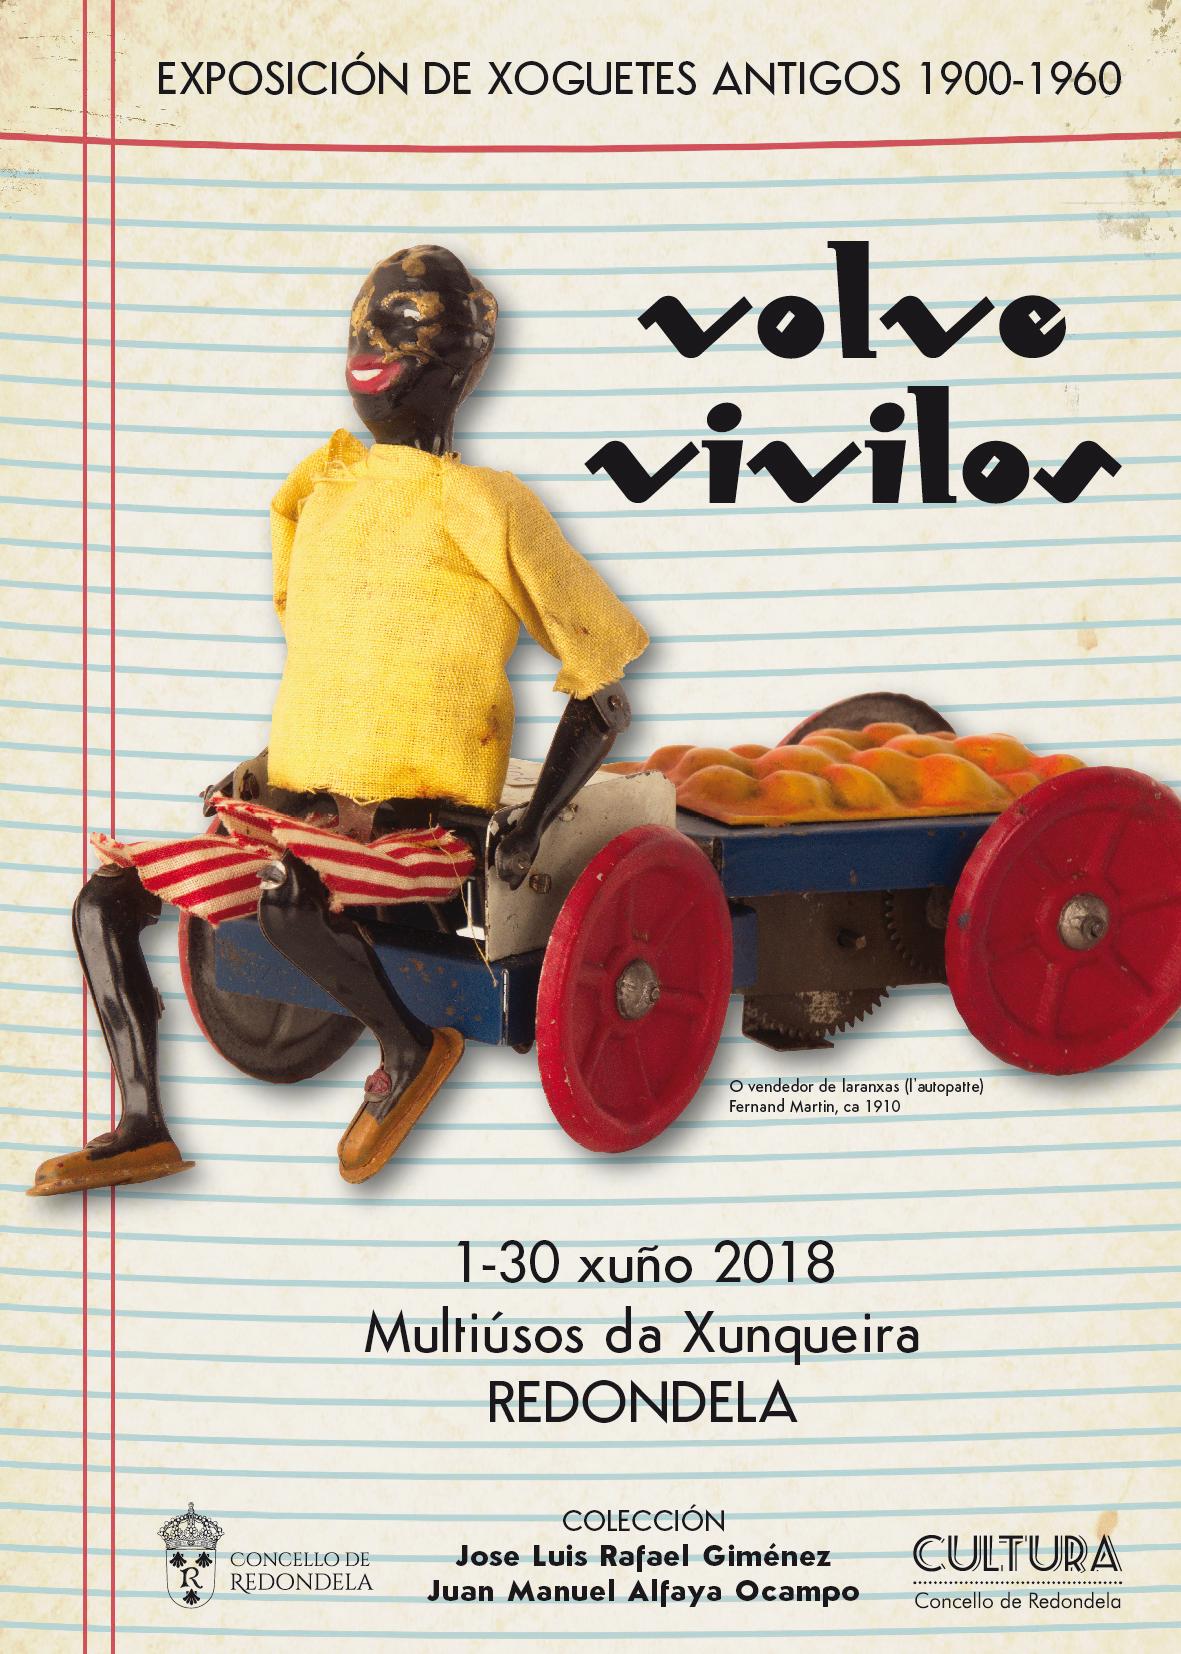 Exposición de juguetes de 1900-1960: VOLVE VIVILOS